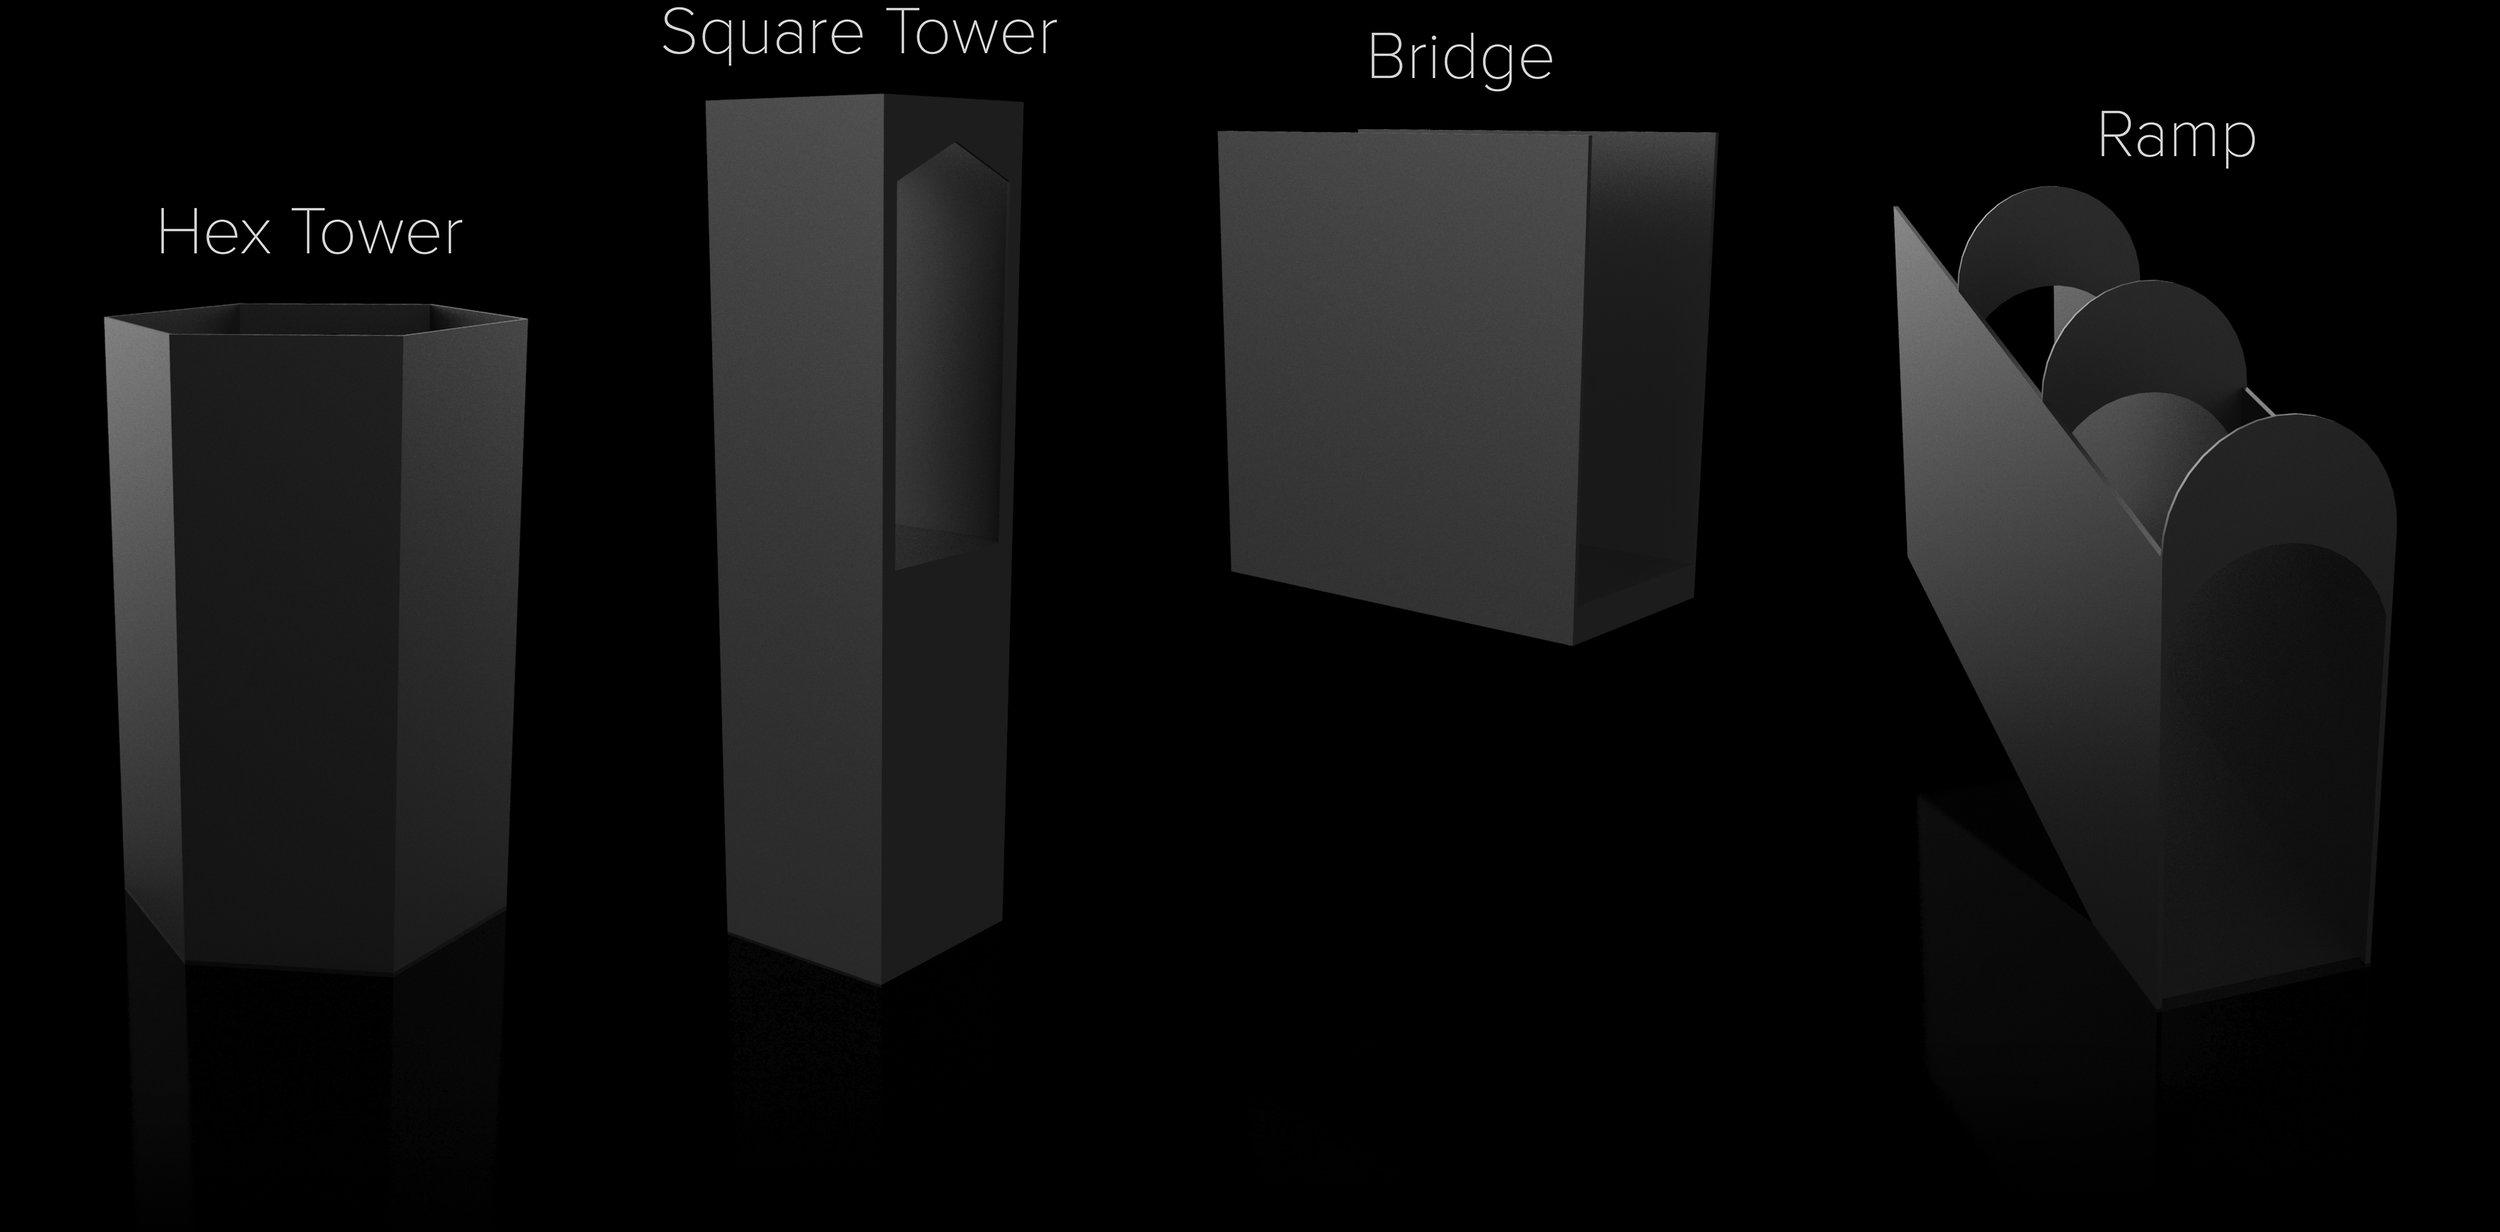 Tower-bridge-ramp